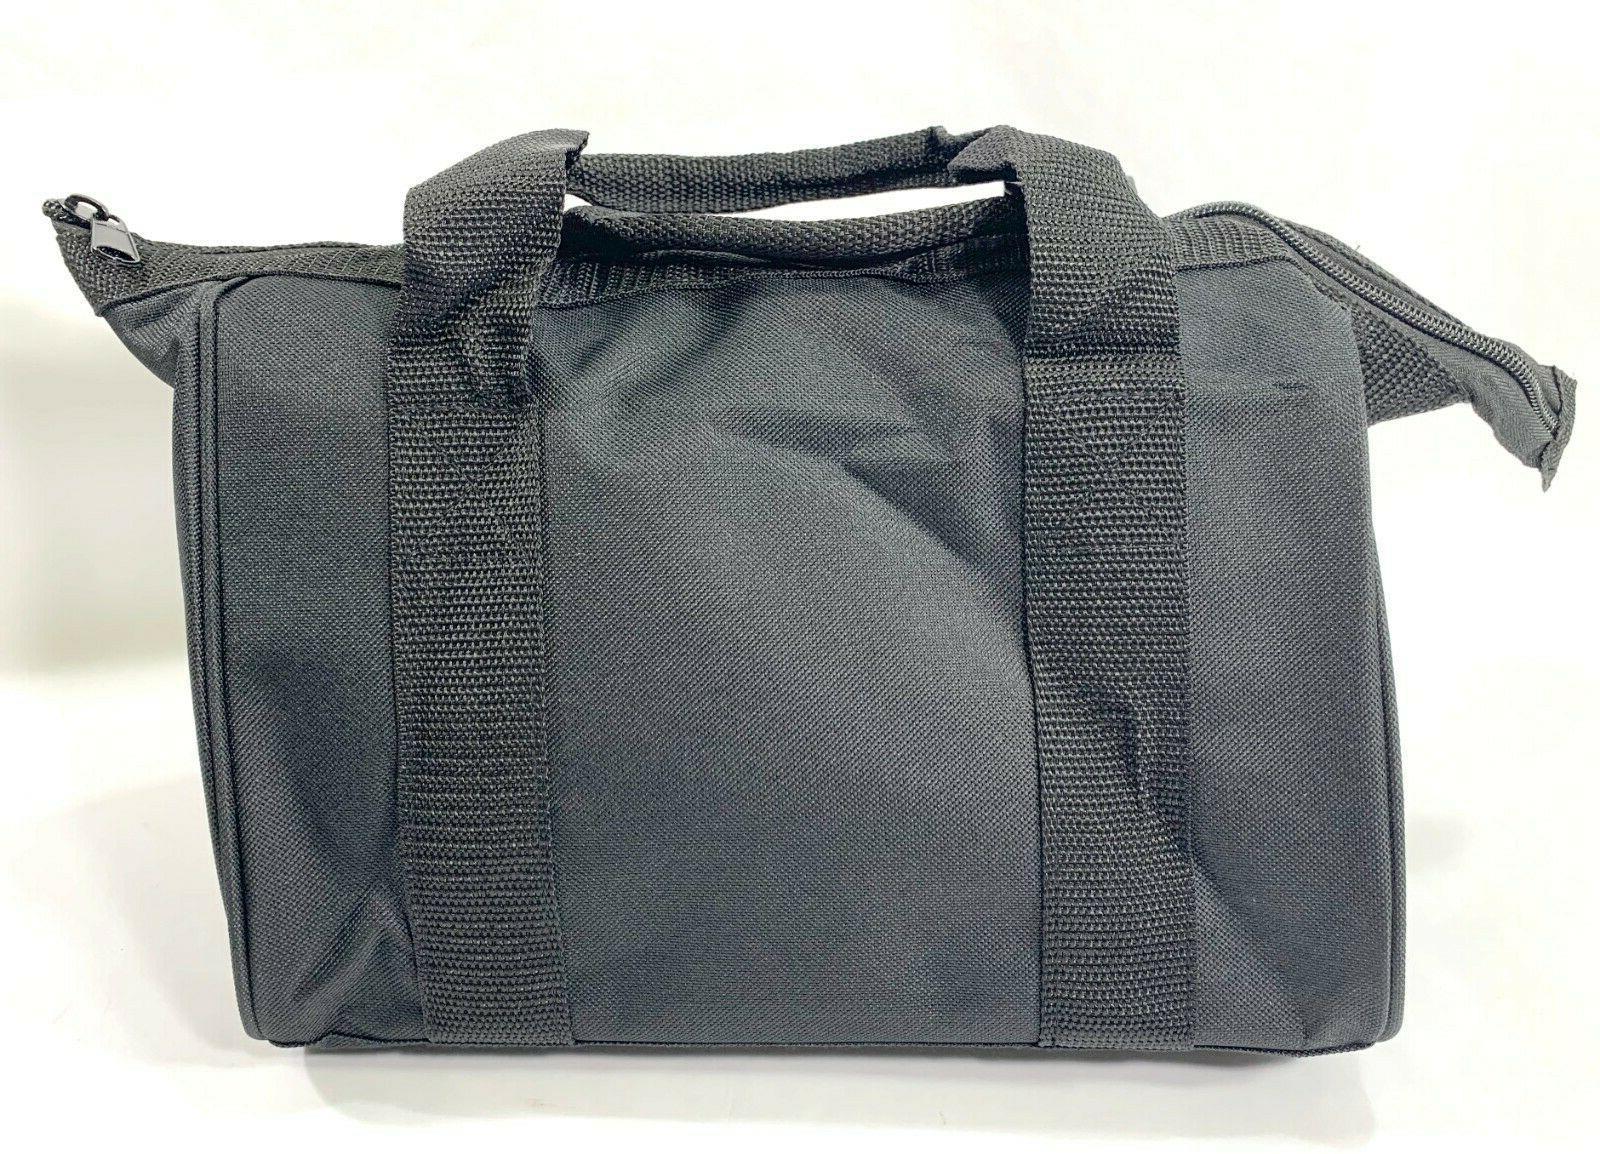 Makita Duty Tool Bag 11 9 9 Blk Ne